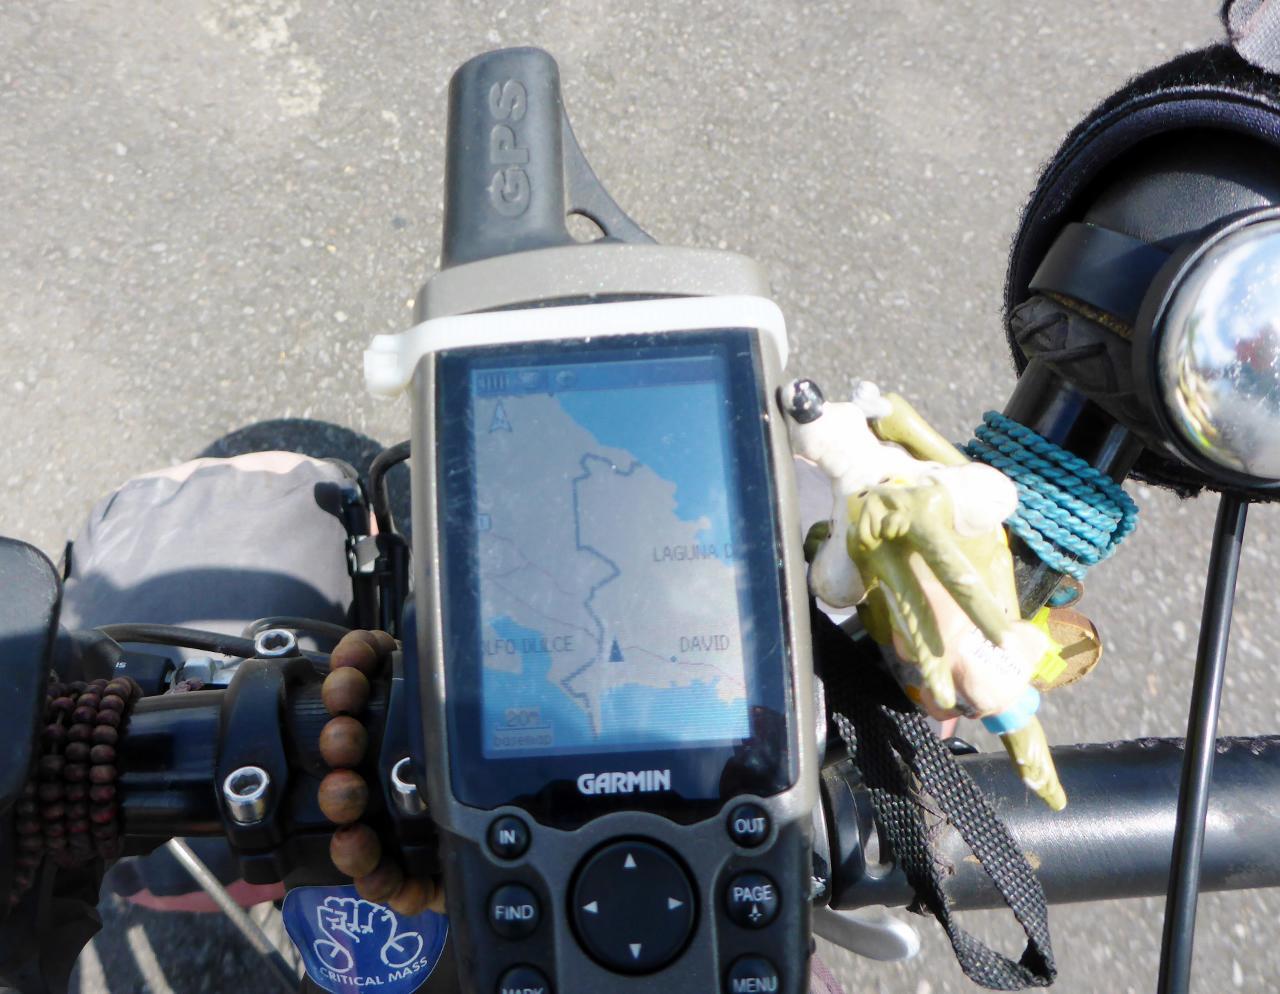 Cycled across the border and headed to David, Panama.